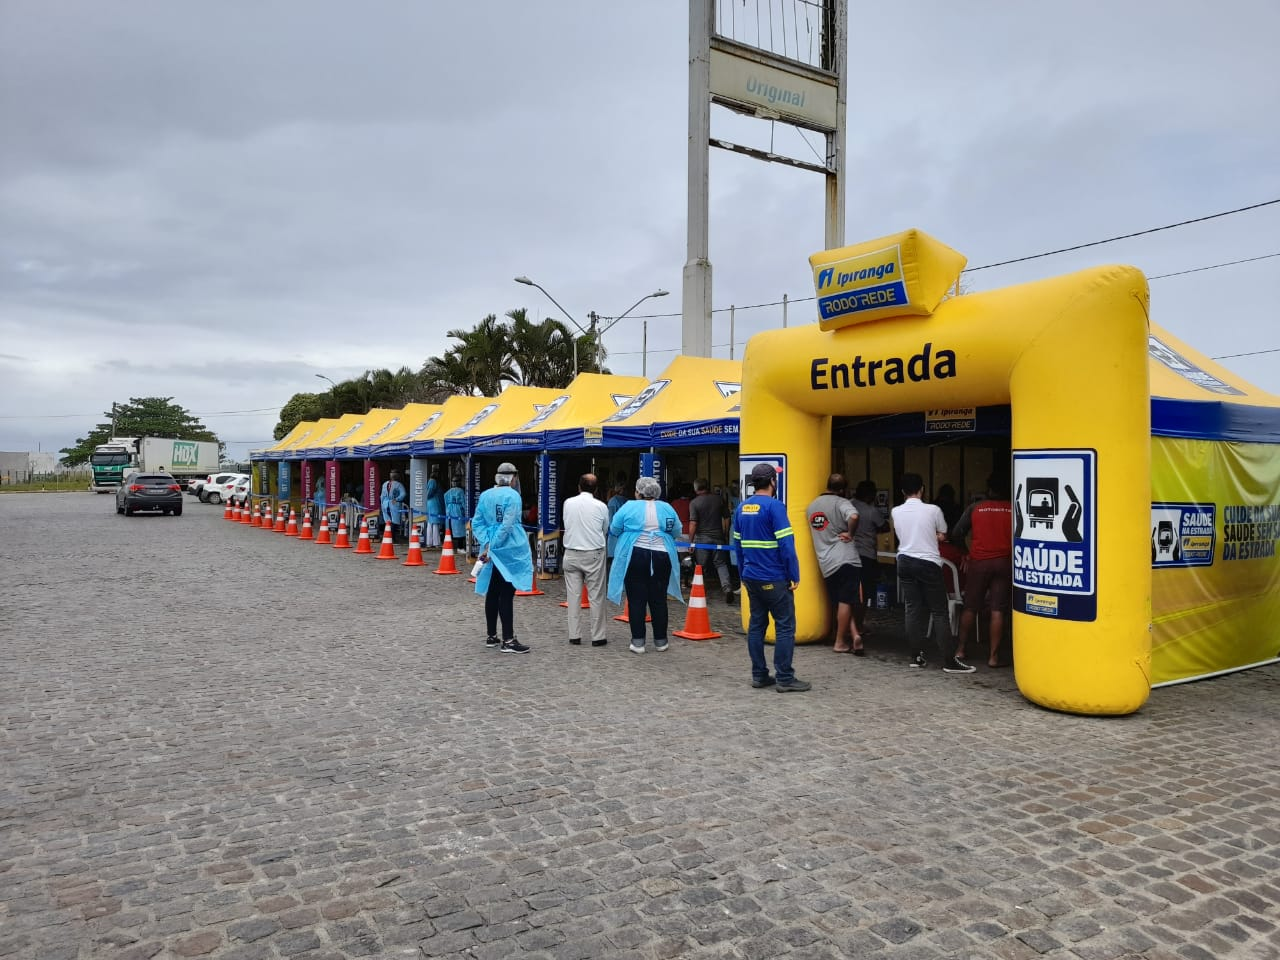 Prefeitura de Eunápolis apoia projeto Saúde nas Estradas 24